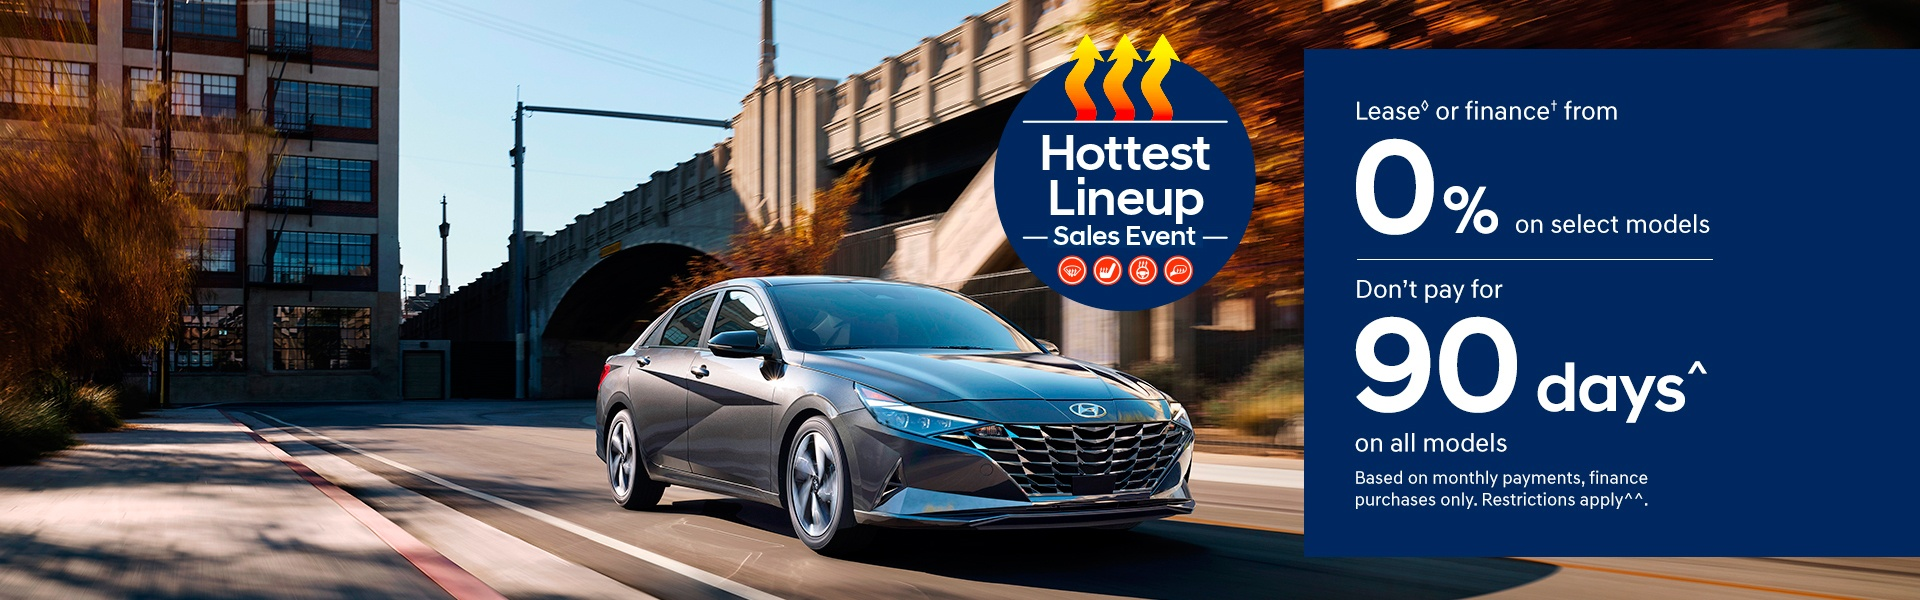 Hyundai-Hottest-LineUp